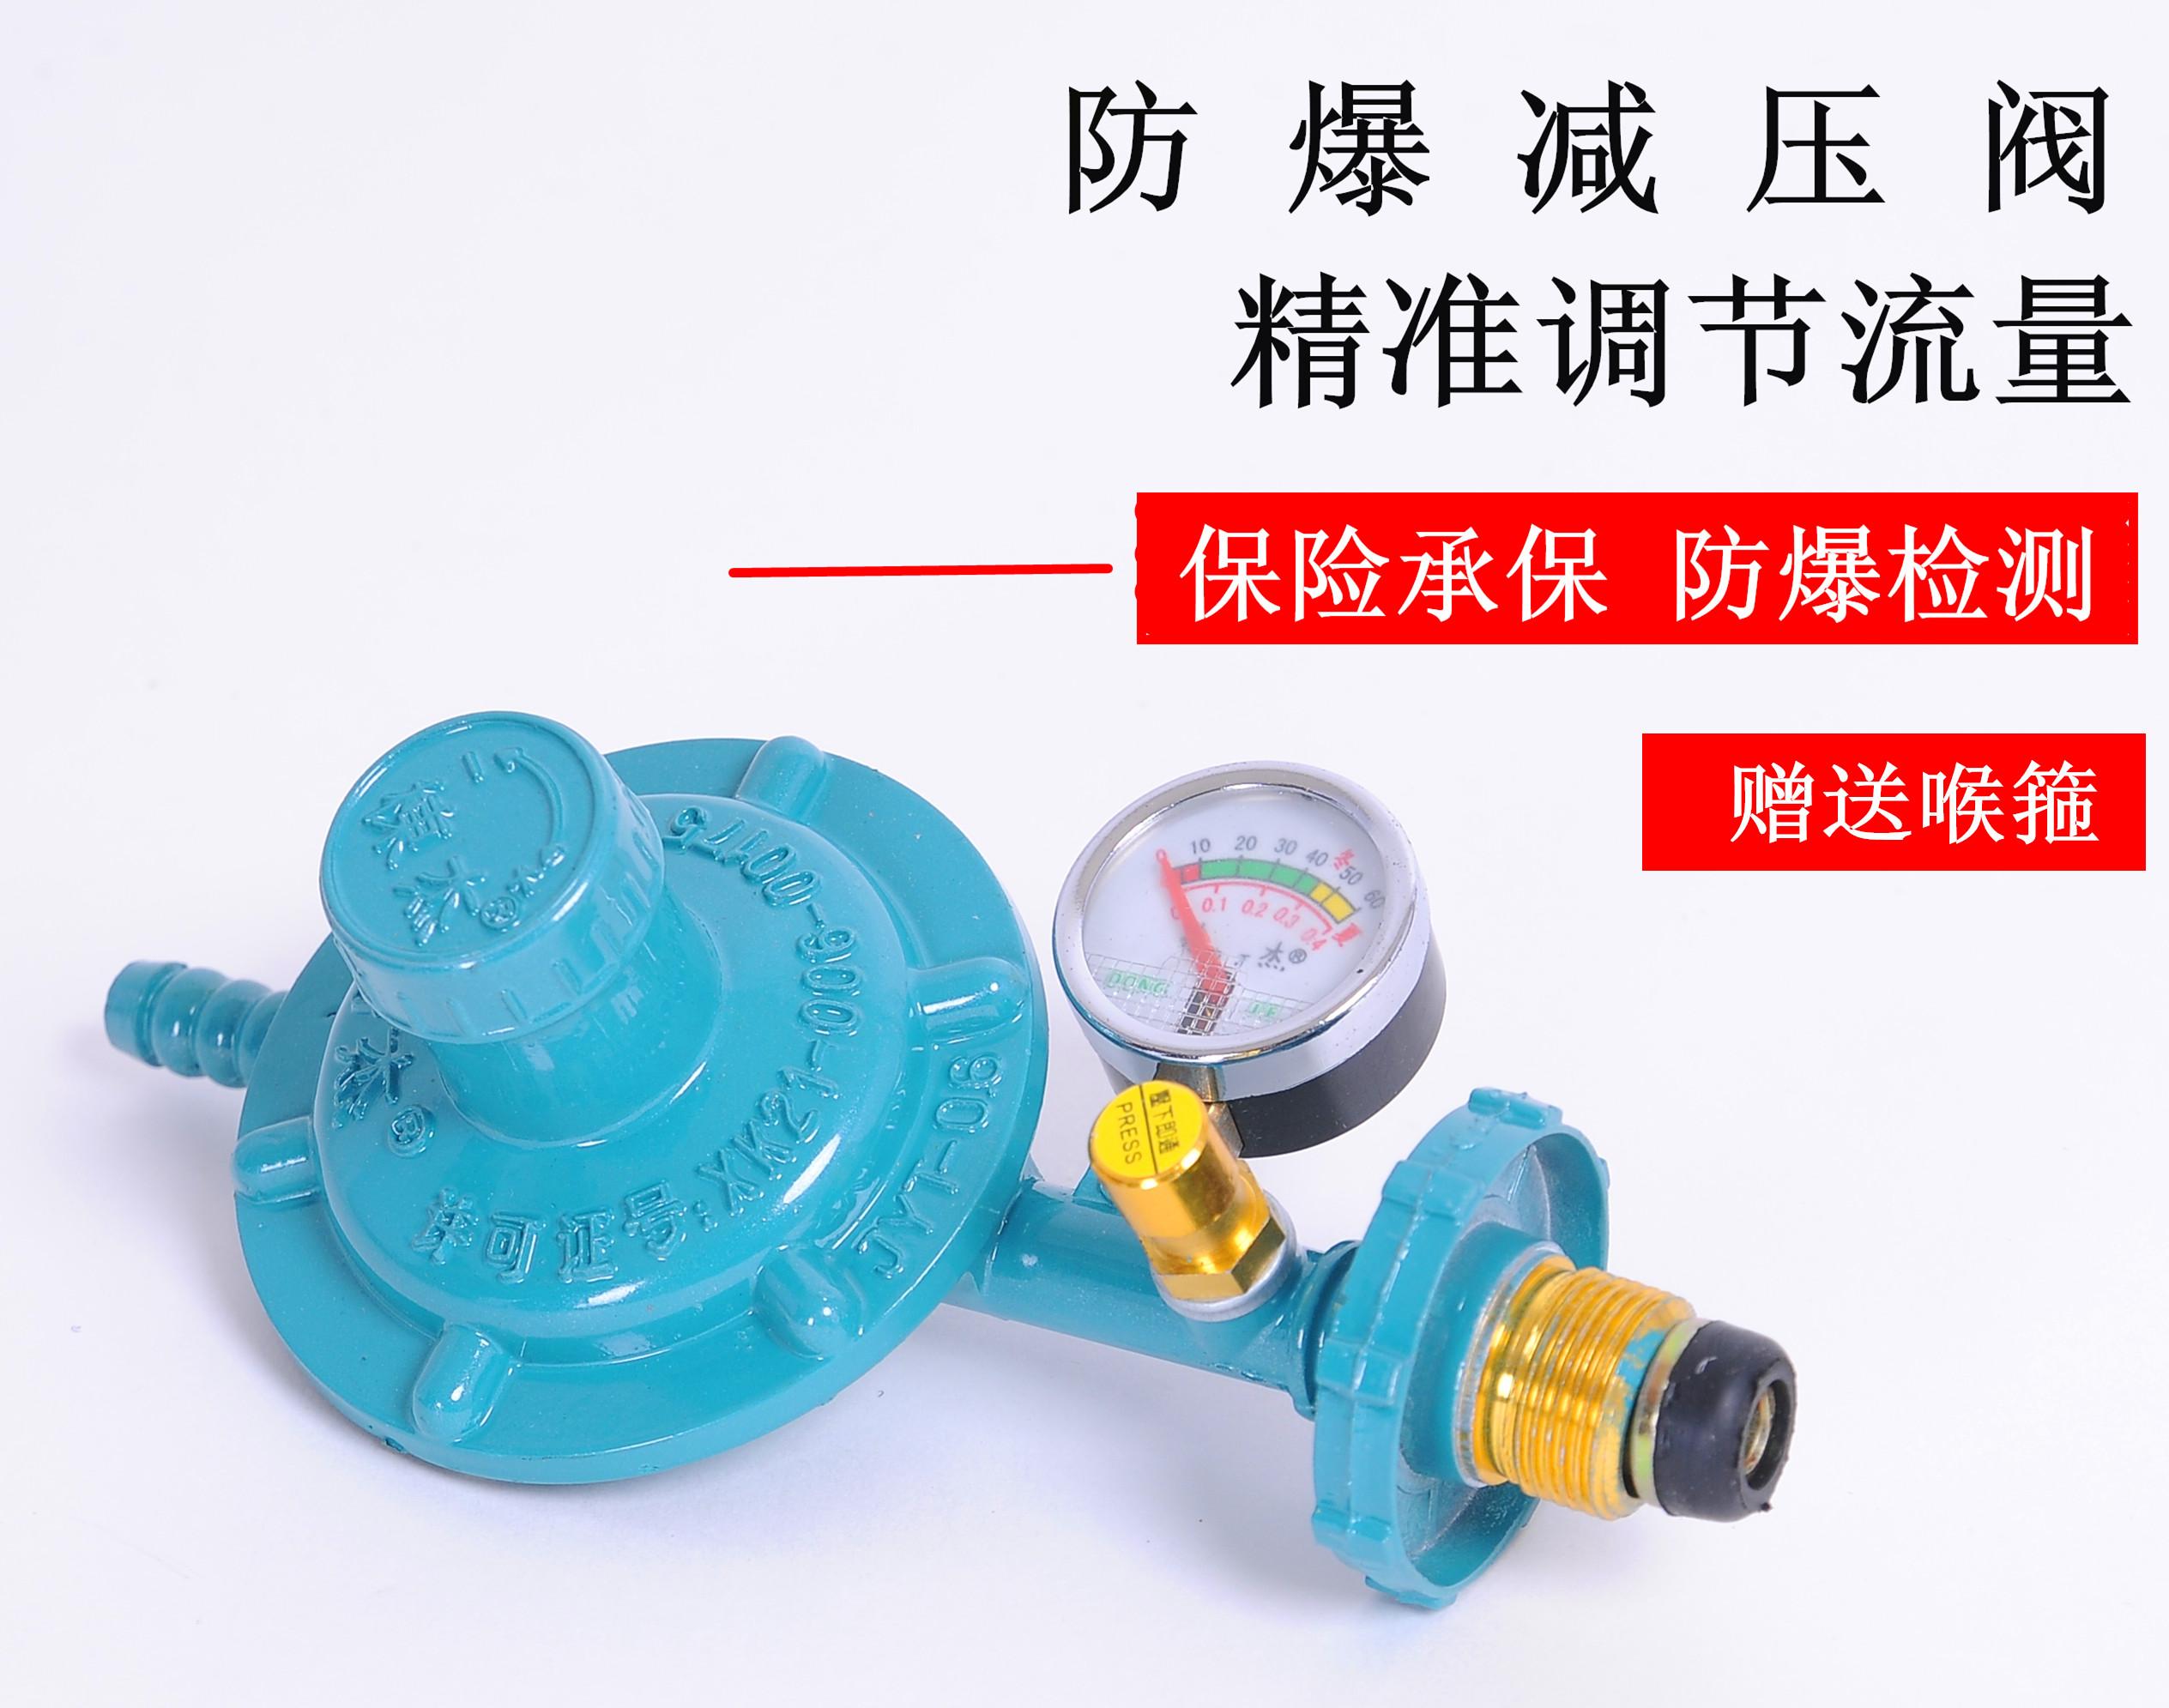 De Midden - en lage druk tank gasfornuis gasfornuis boiler gas flessen vloeibaar gas klep klep.